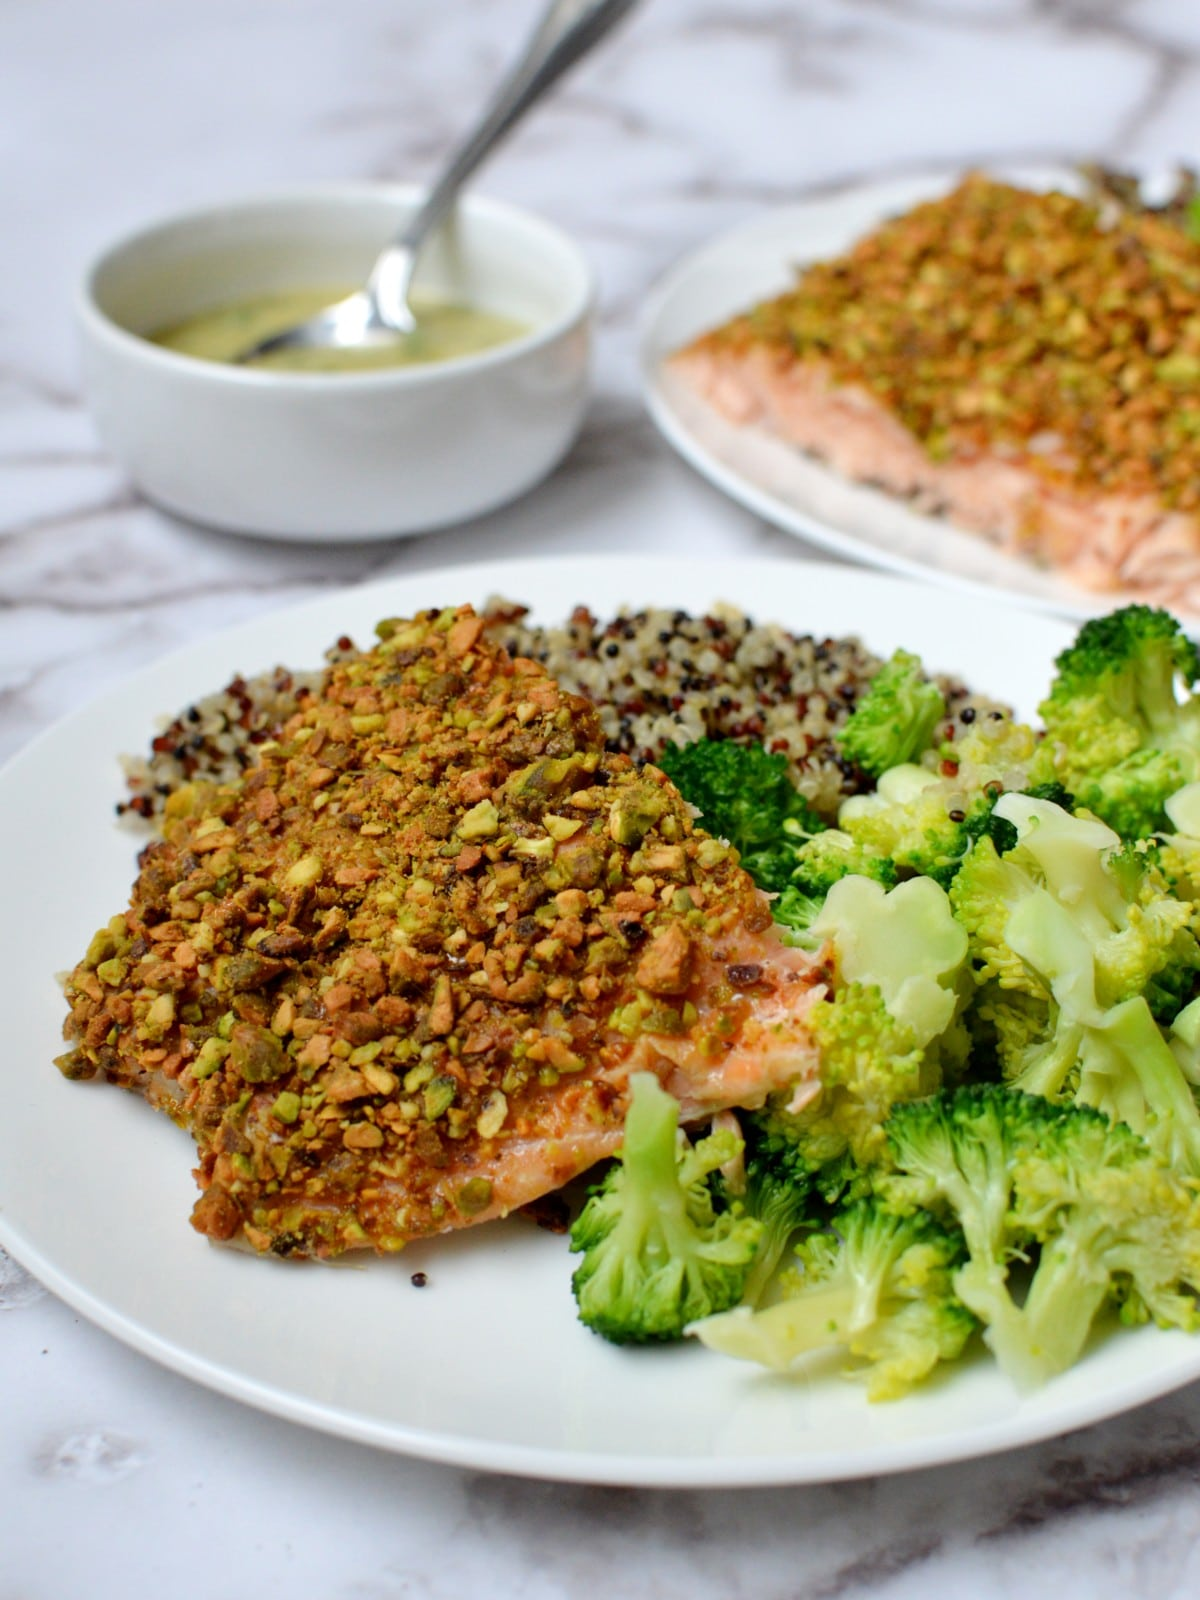 Pistachio encrusted salmon with broccoli